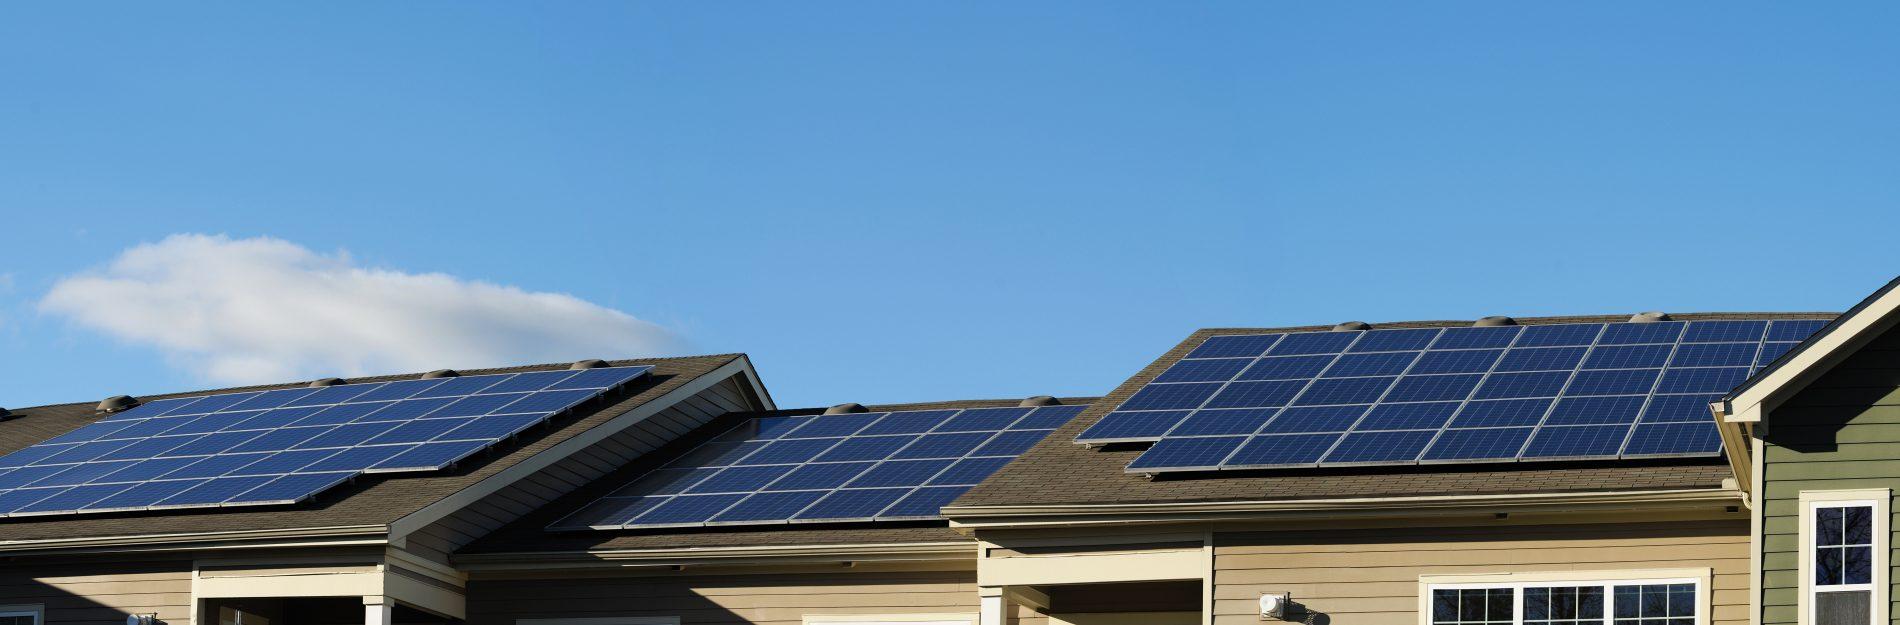 Comparing Solar Panel Installation Options